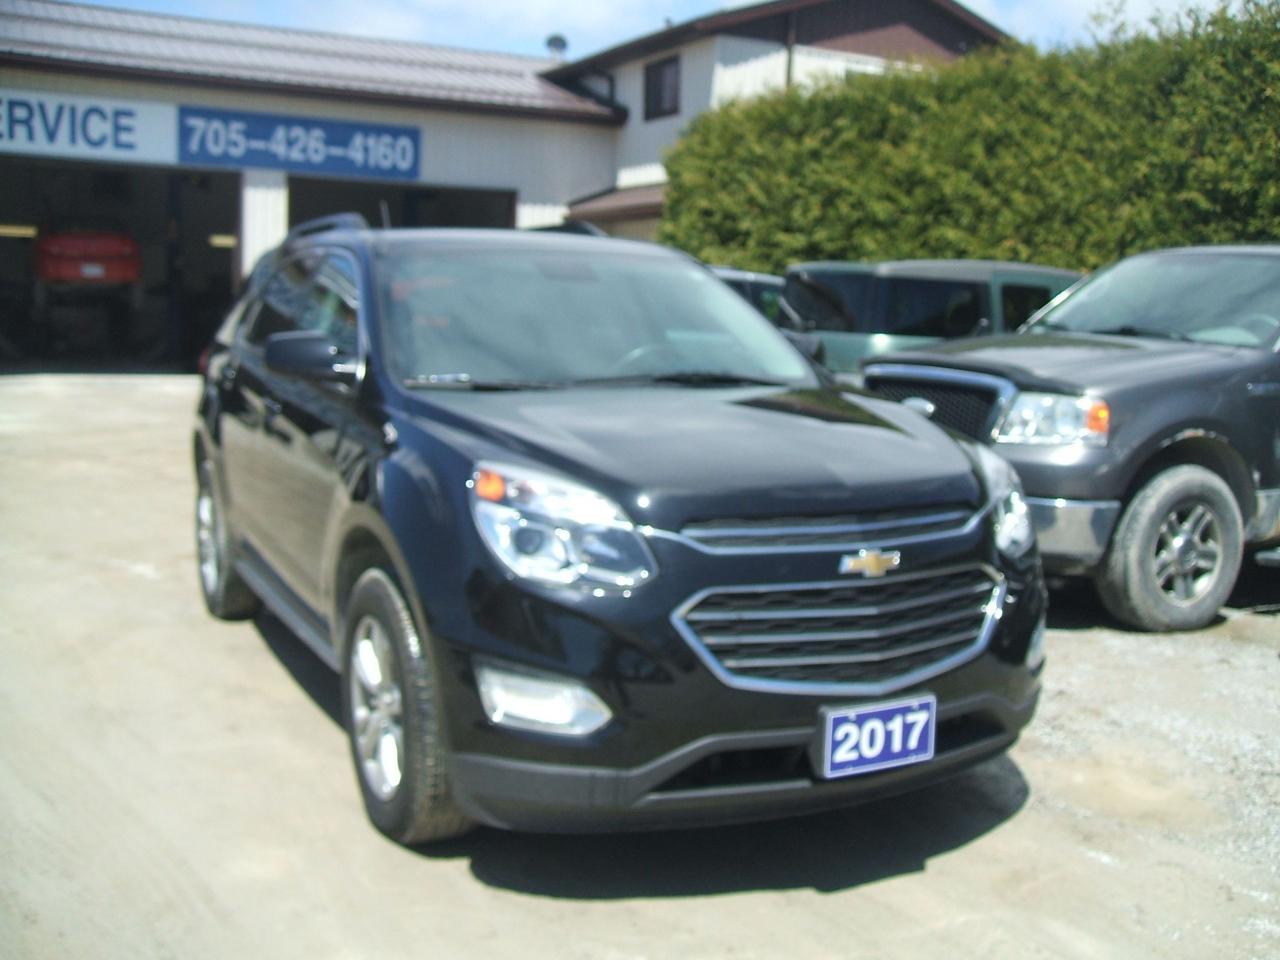 Photo of Black 2017 Chevrolet Equinox